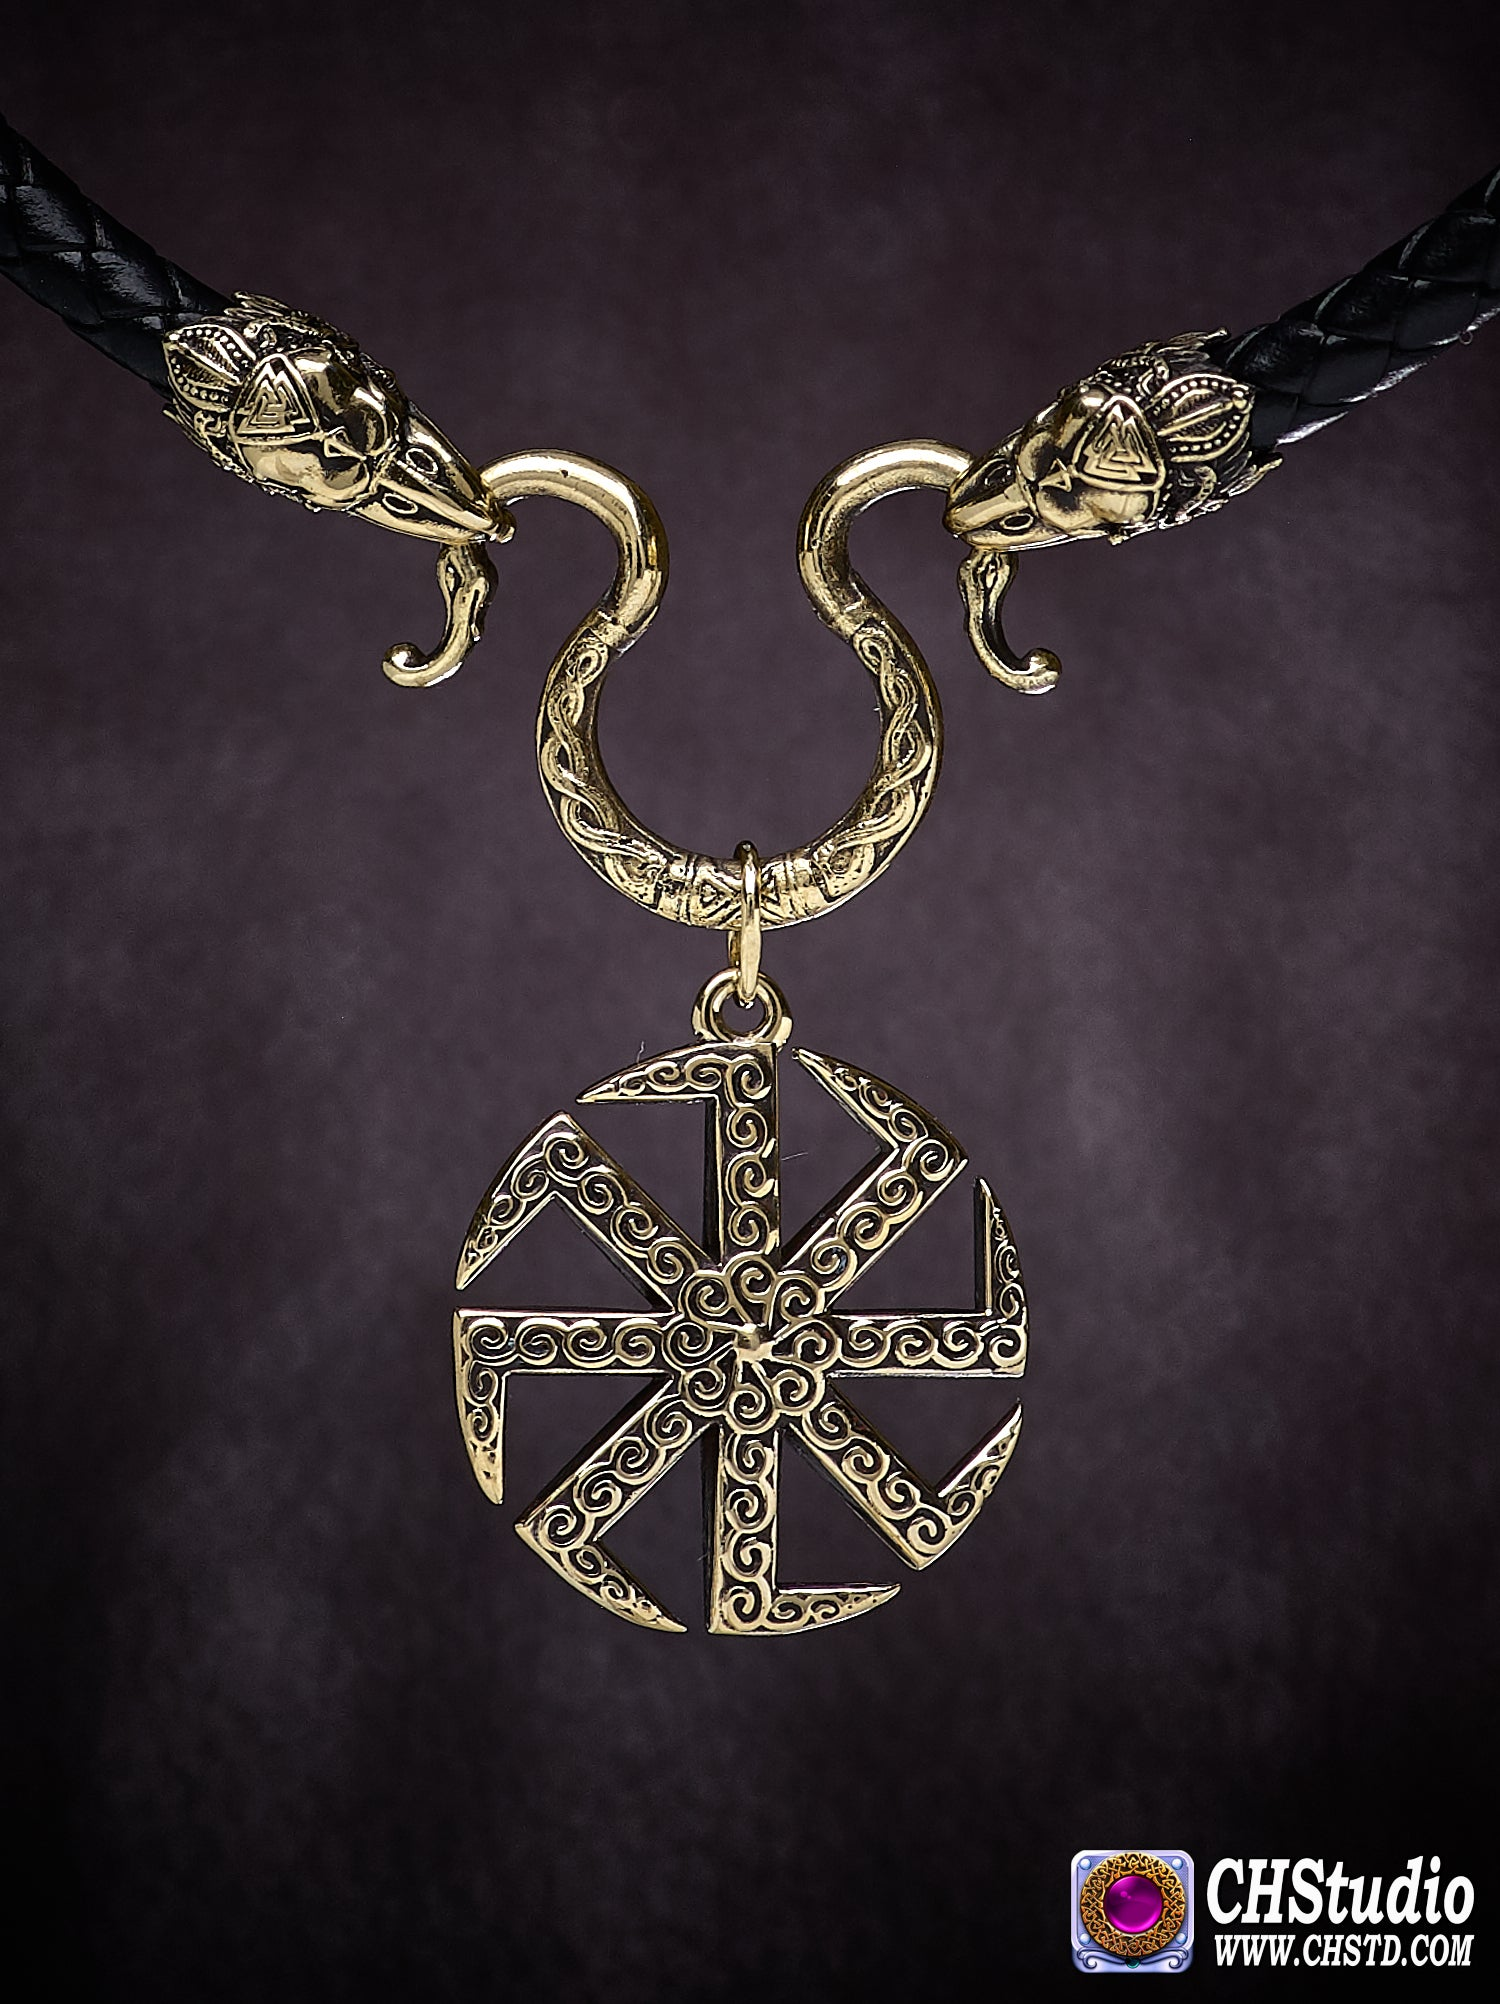 Image of Kolovrat with Raven Heads Necklace